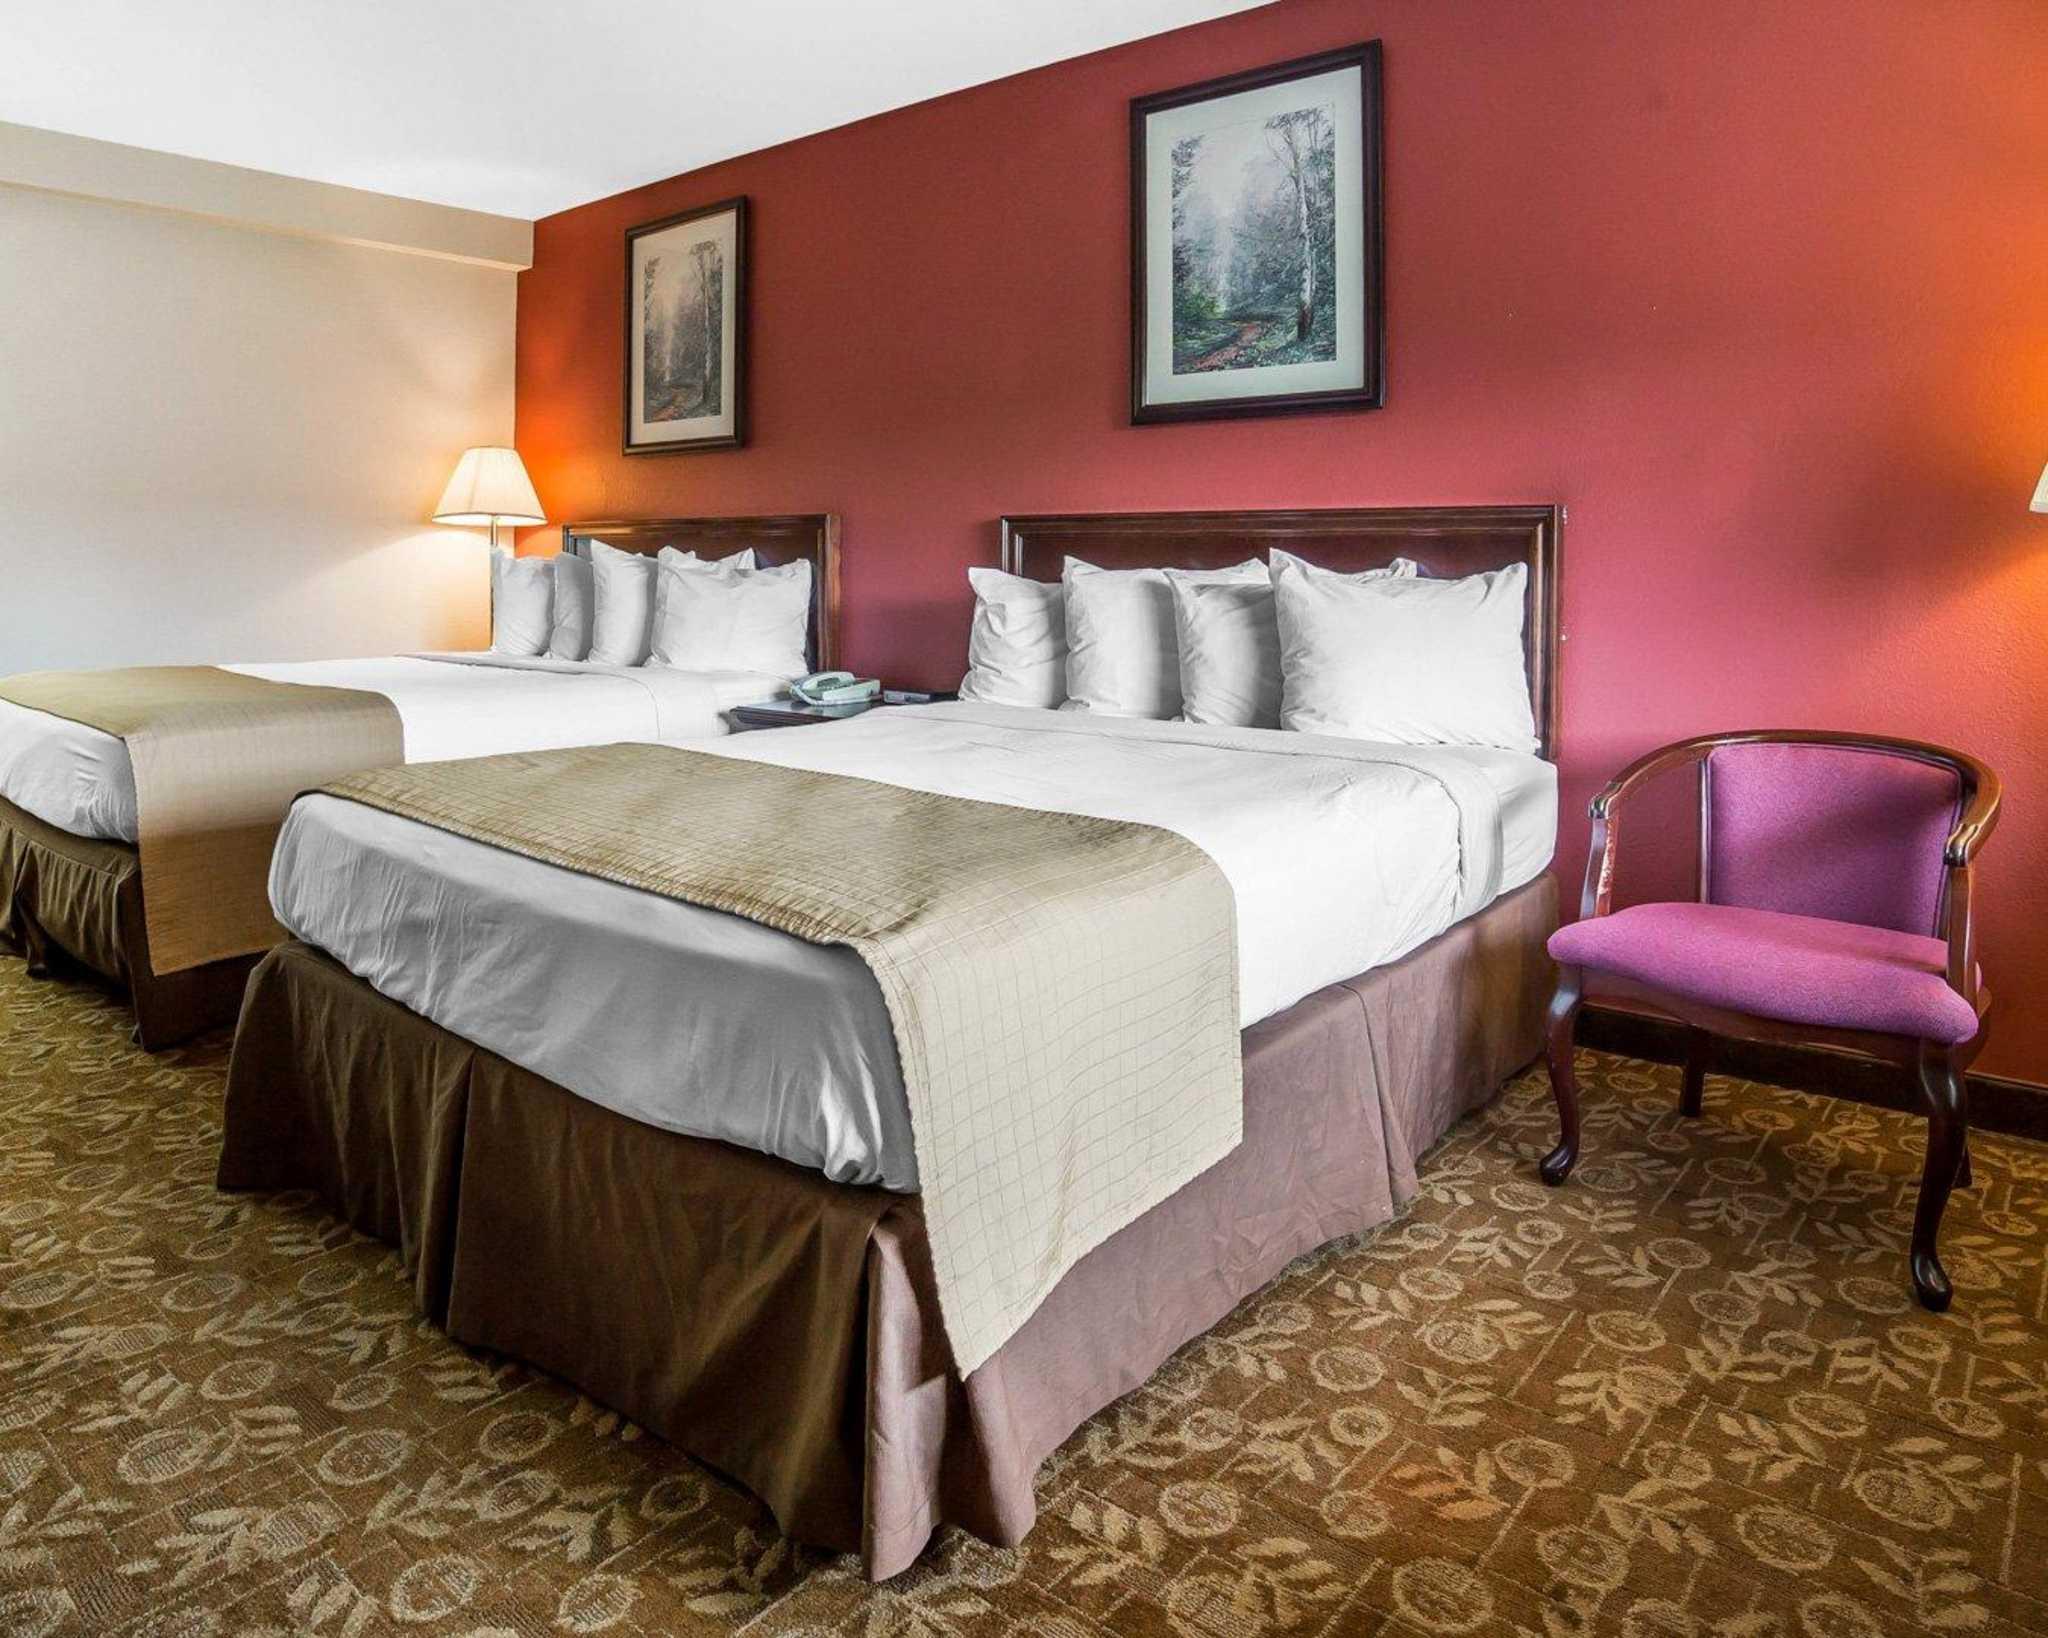 Quality Inn & Suites Minden US-395 image 11